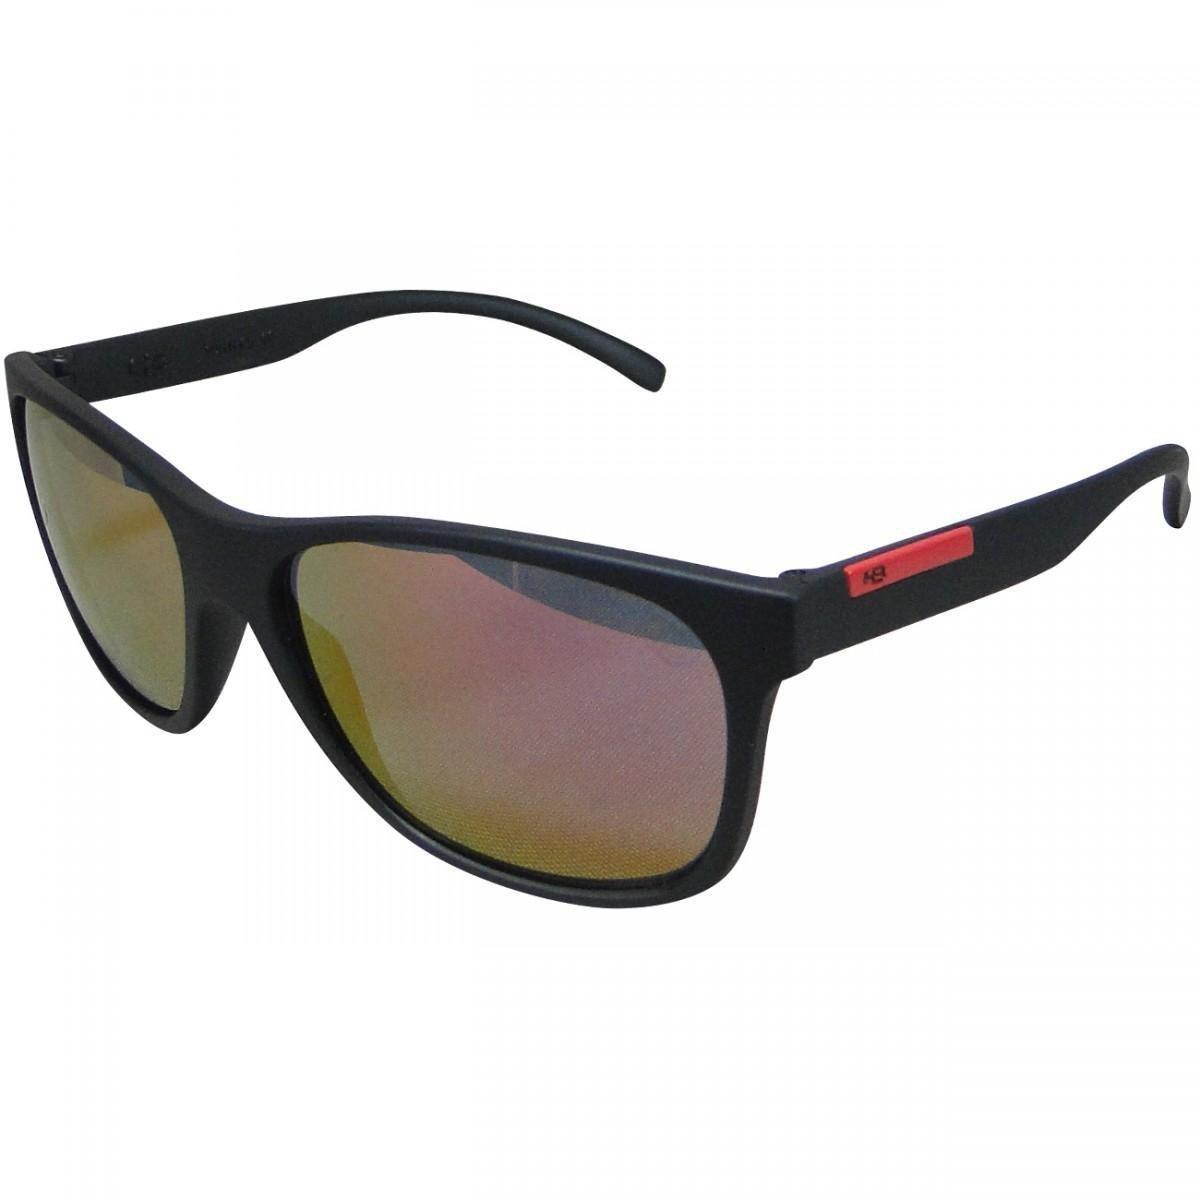 61f67a196113c Oculos HB Underground - Compre Agora